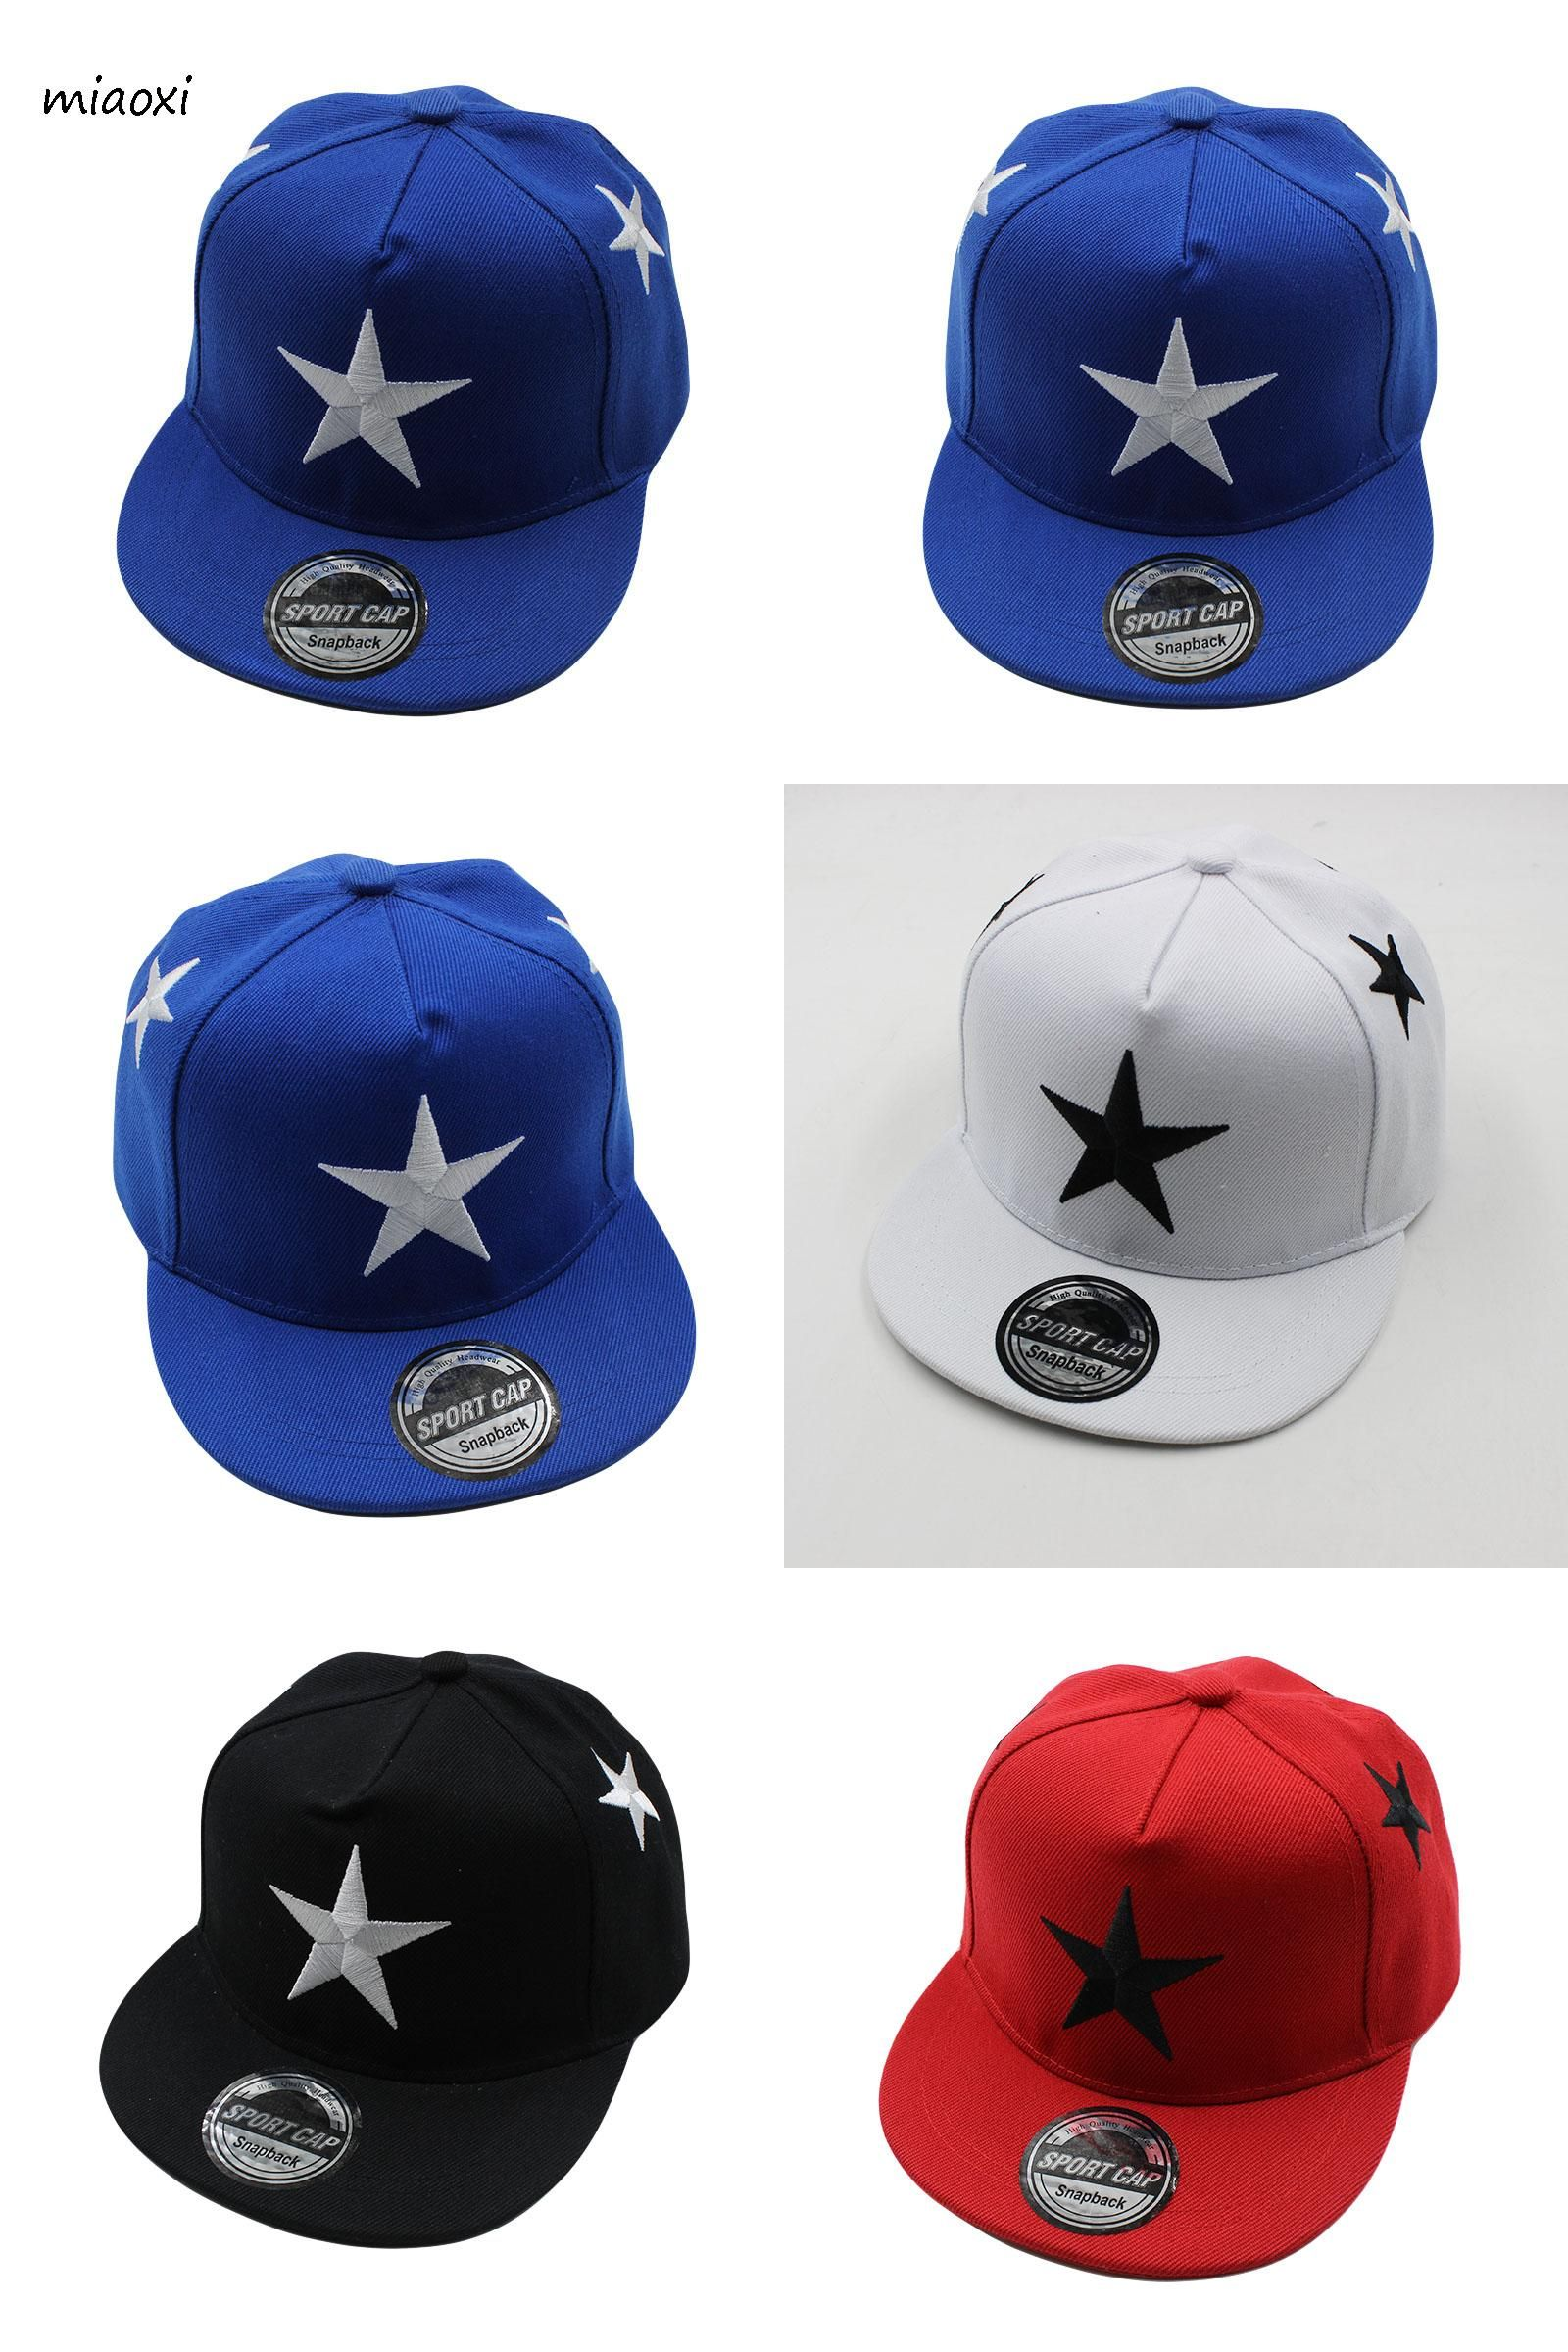 a3149961b7fdb  Visit to Buy  miaoxi Fashion Children Boy Cap Baseball Girls Summer Star  Hats Sun Children Hip Hop Caps High Quality Snapback Gorras Bone   Advertisement